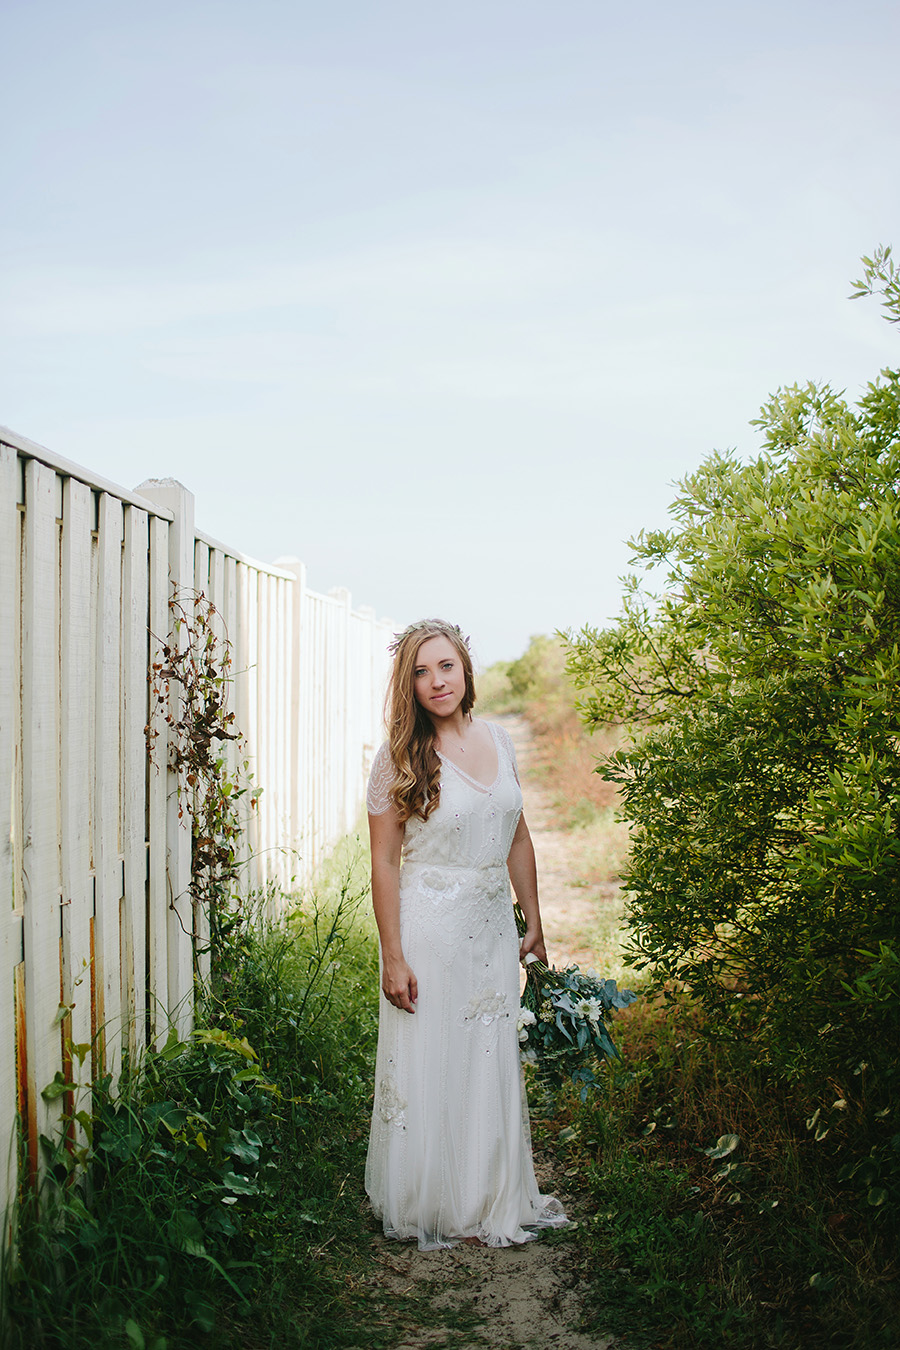 DavisWedding - Alicia White Photography-621.jpg